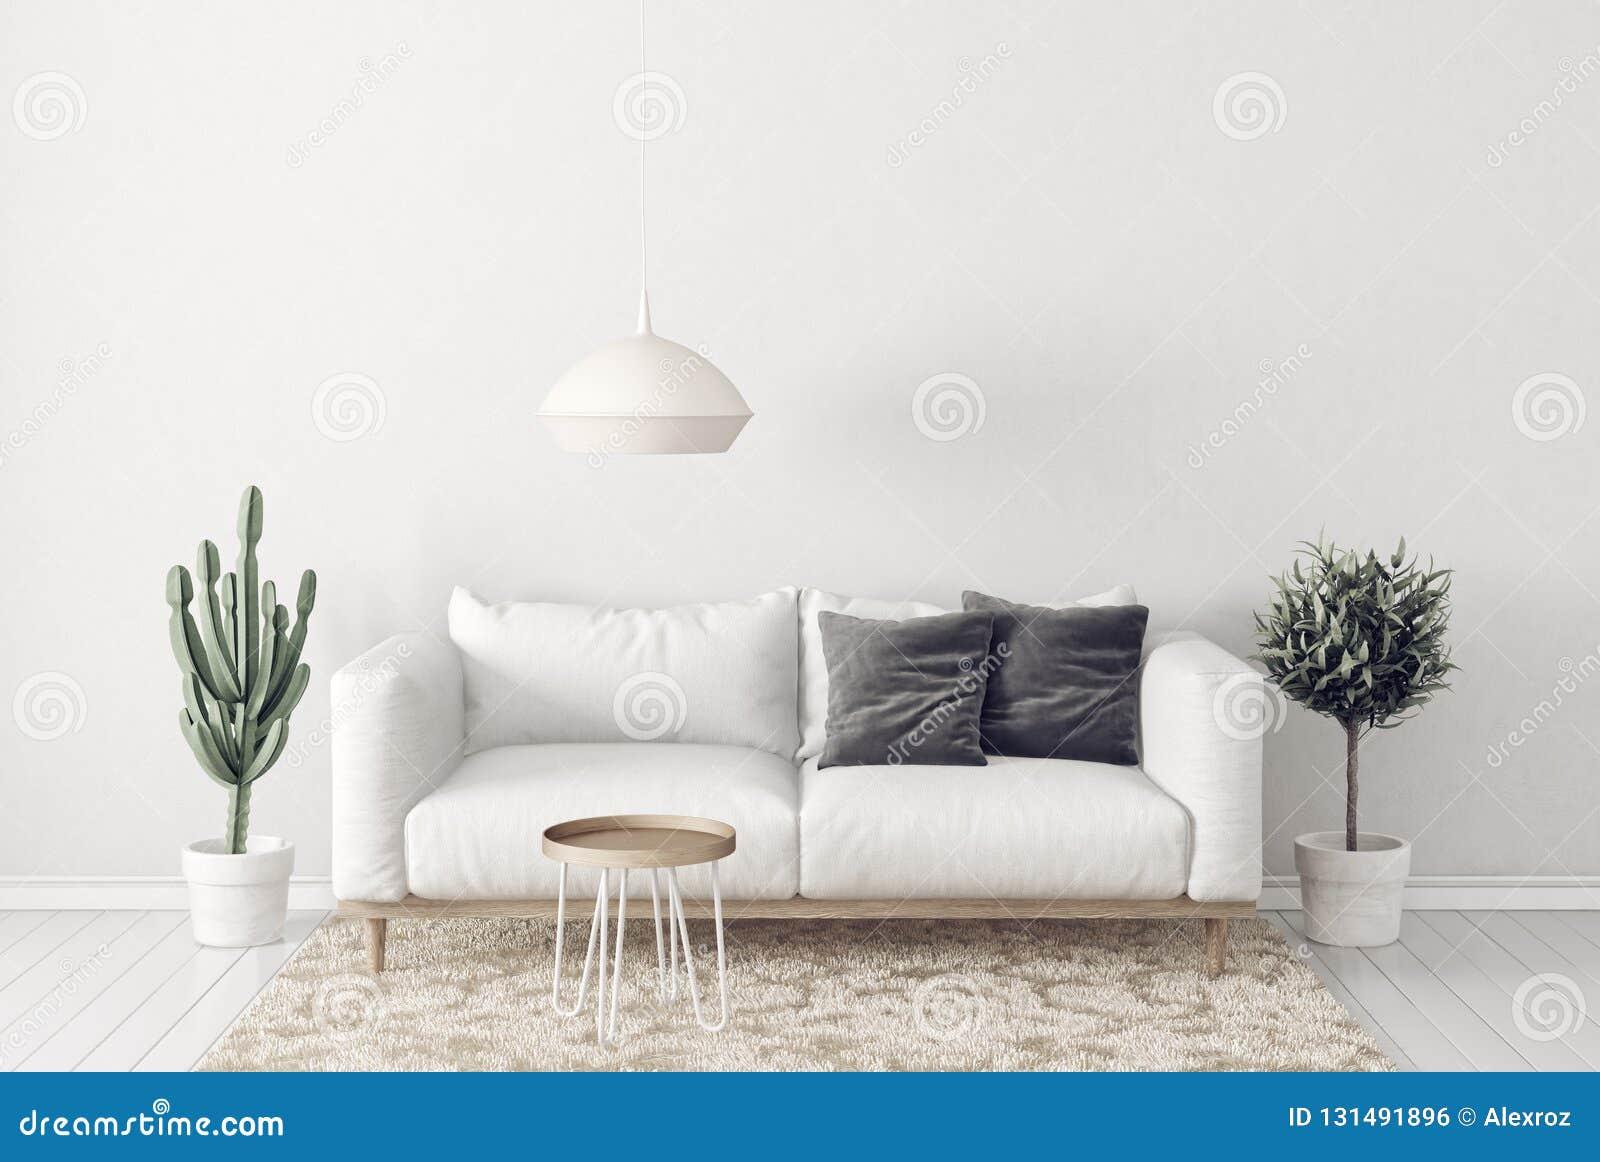 Modern Living Room With Sofa And Lamp. Scandinavian Interior ...